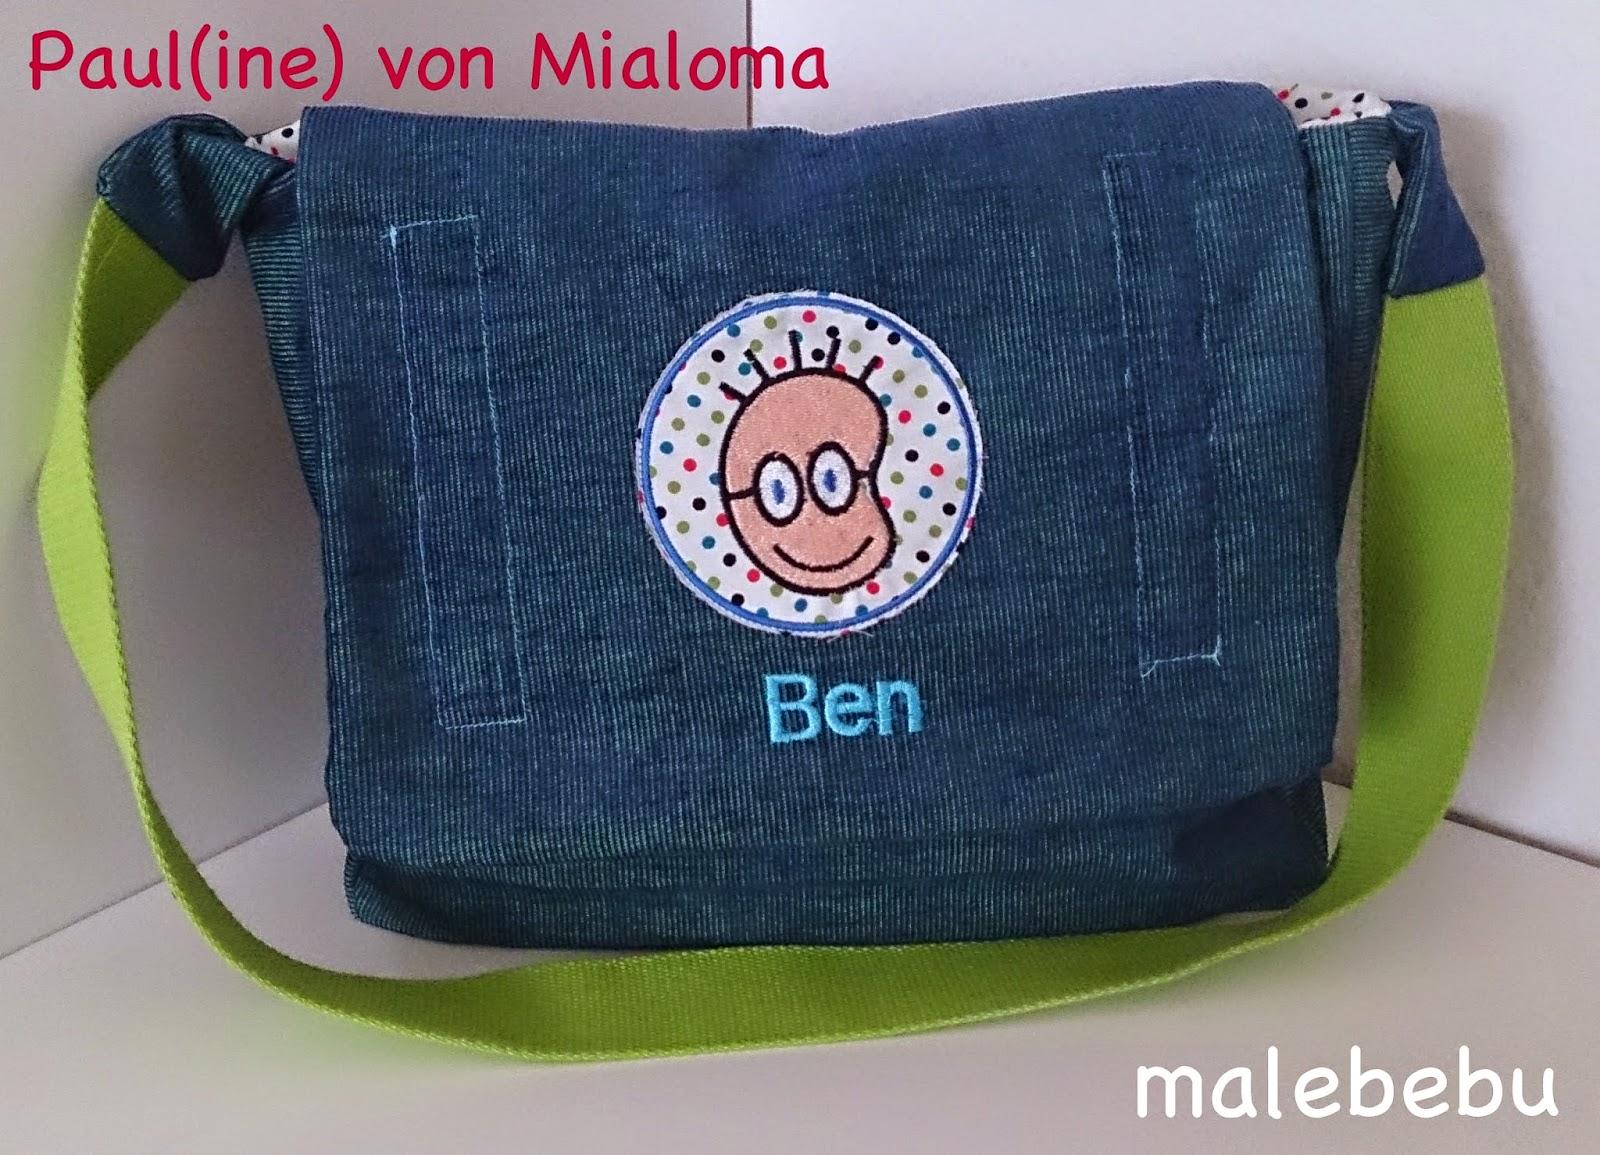 malebebu paul ine freebook kindergartentasche. Black Bedroom Furniture Sets. Home Design Ideas